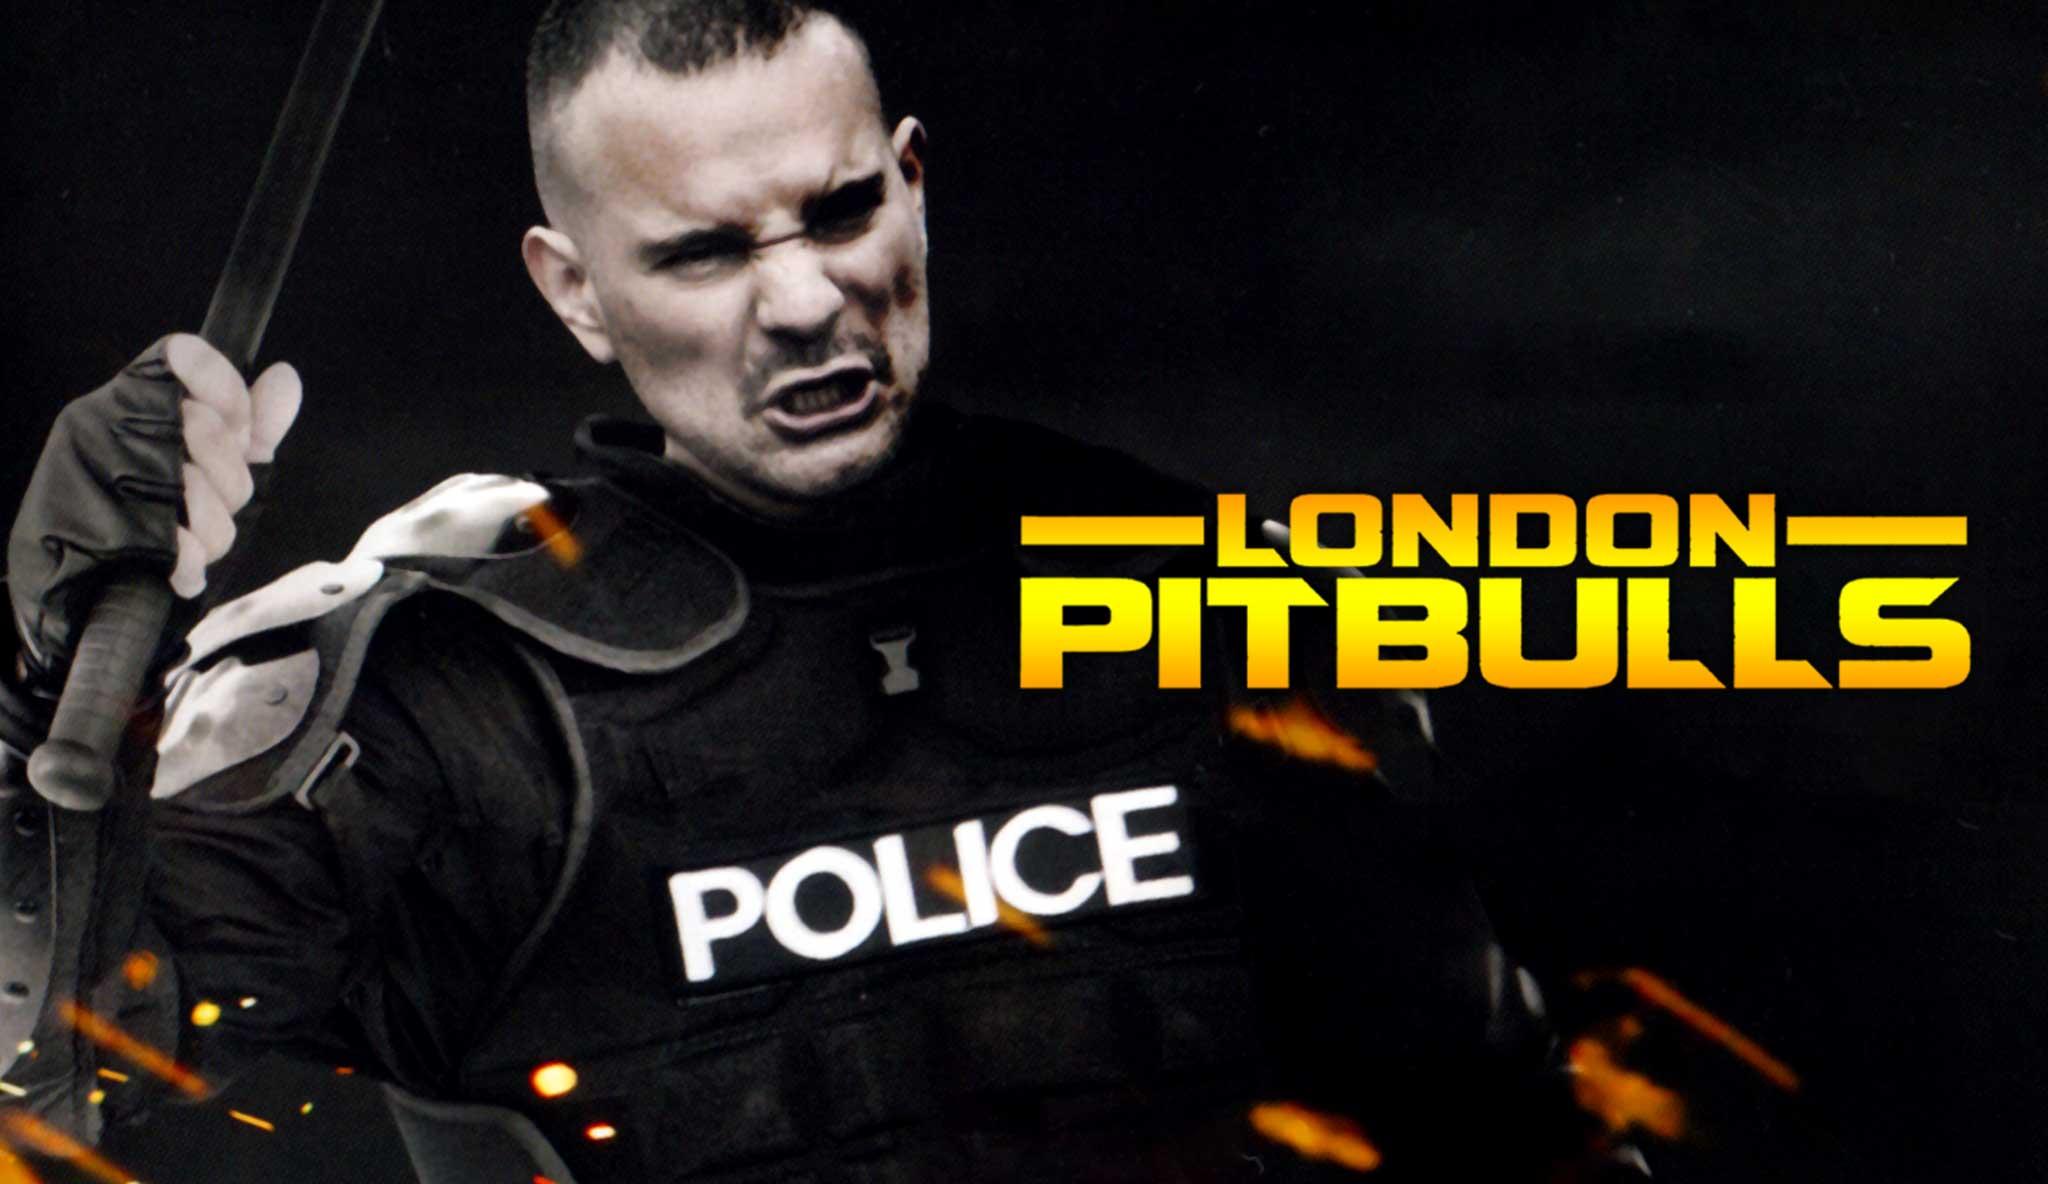 london-pitbulls\header.jpg